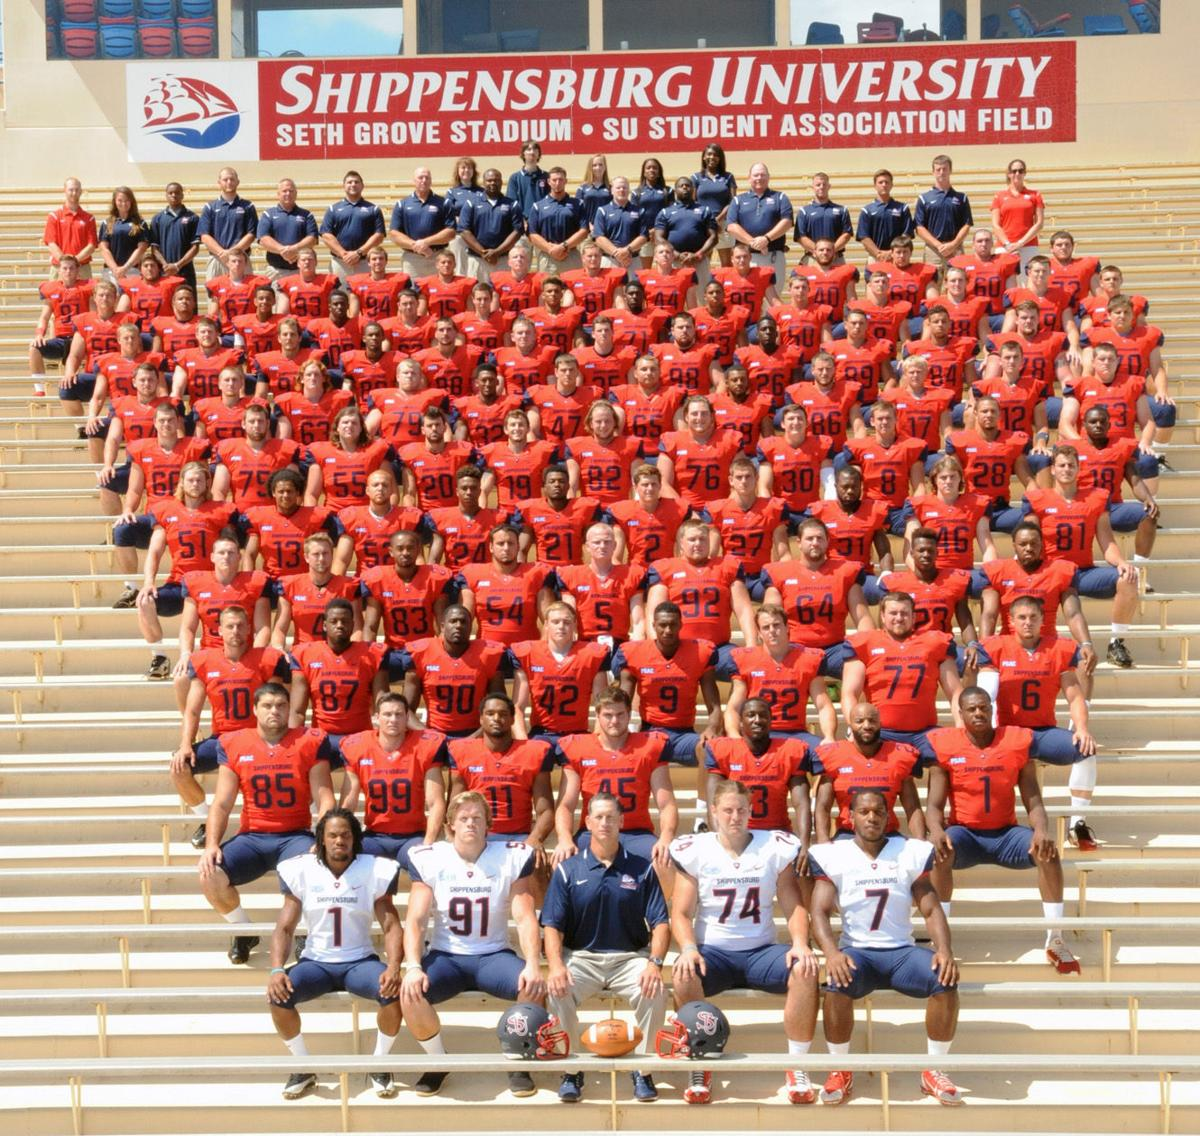 Shippensburg Campus